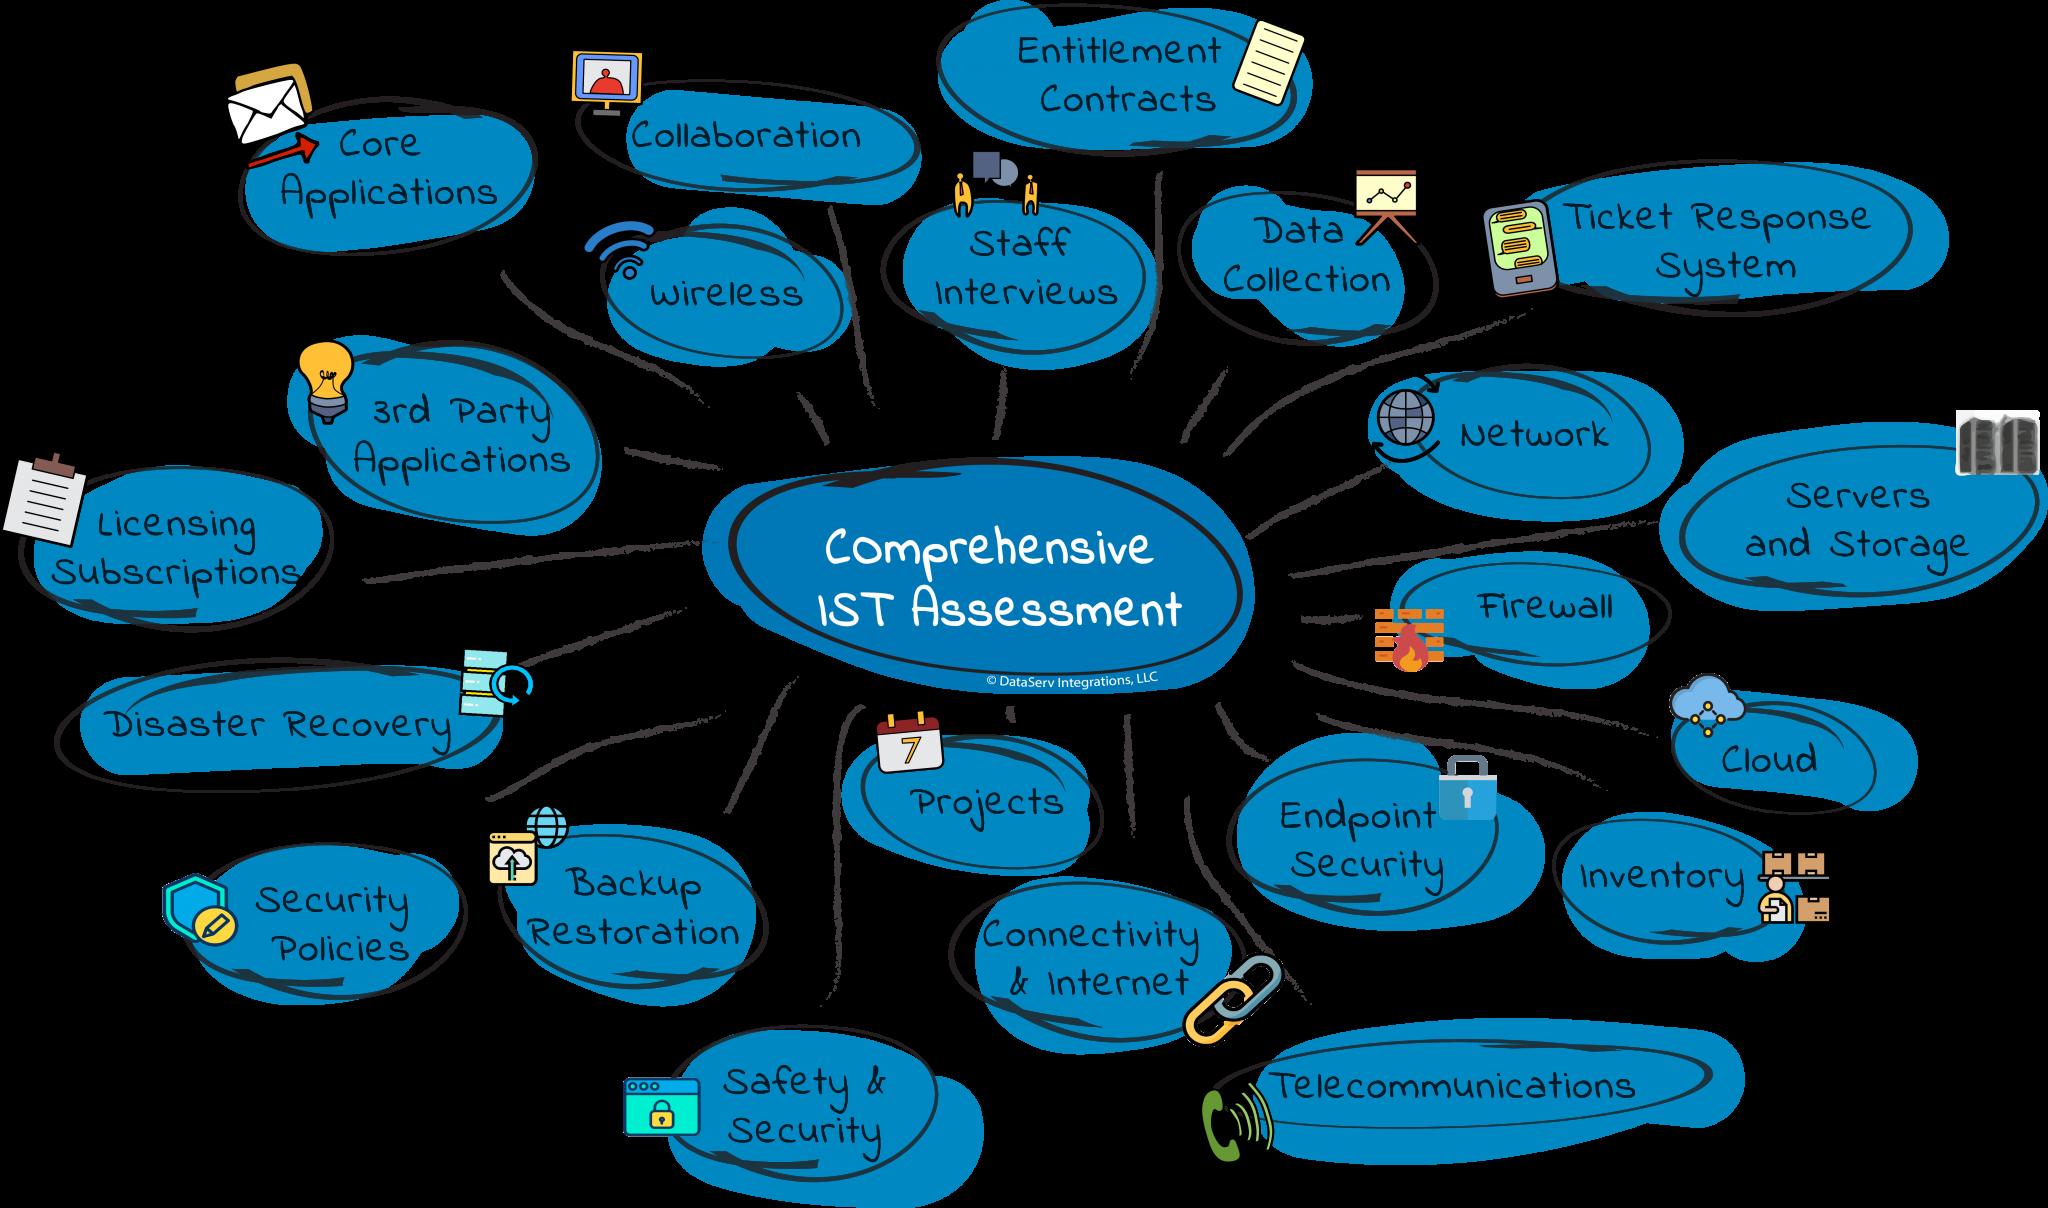 Comprehensive IST Assessment Diagram